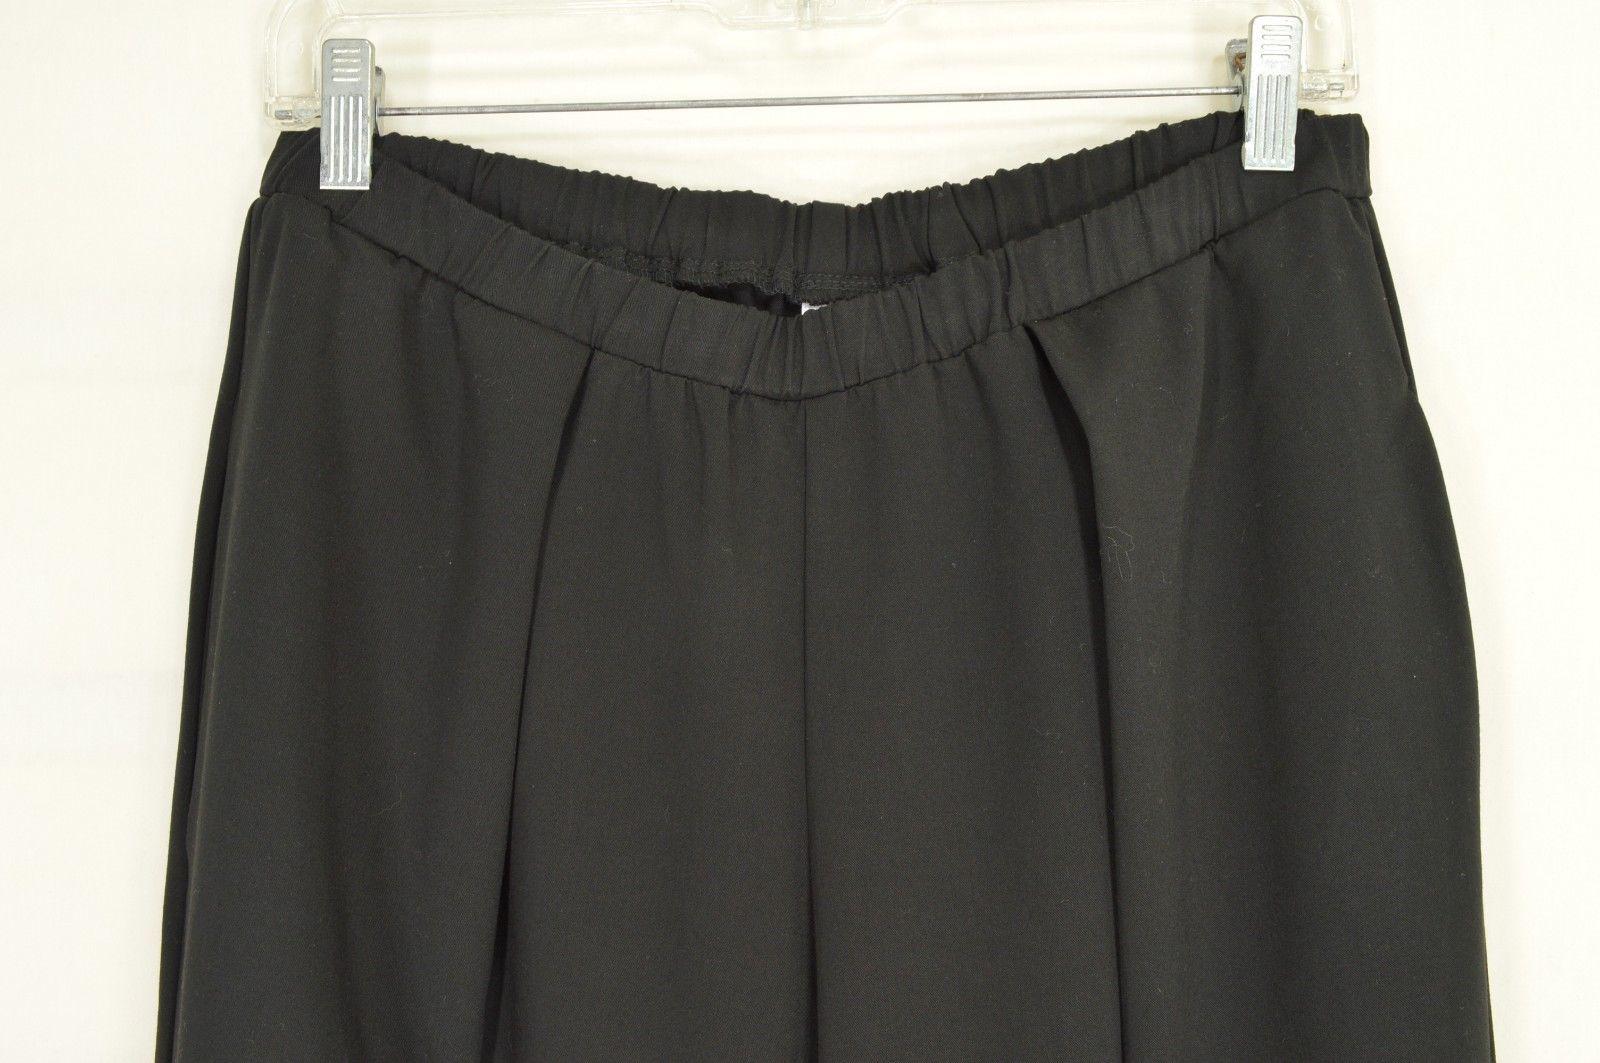 1 Planet Lauren Grossman pants SZ 3 black Lagenlook wide leg pleat pockets USA